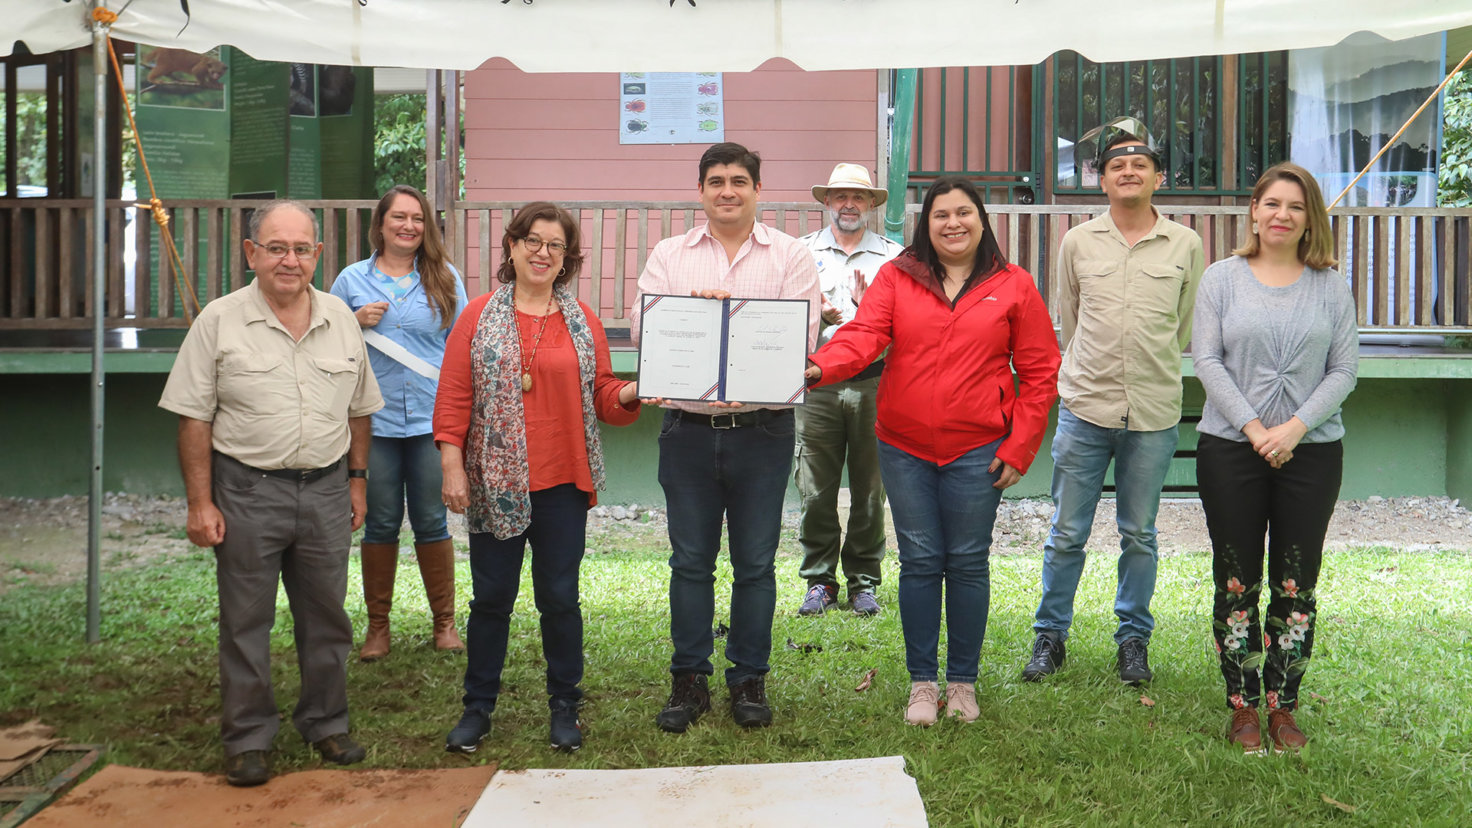 Presidente firma en Tapantí histórica ley que garantiza el acceso al agua como derecho humano